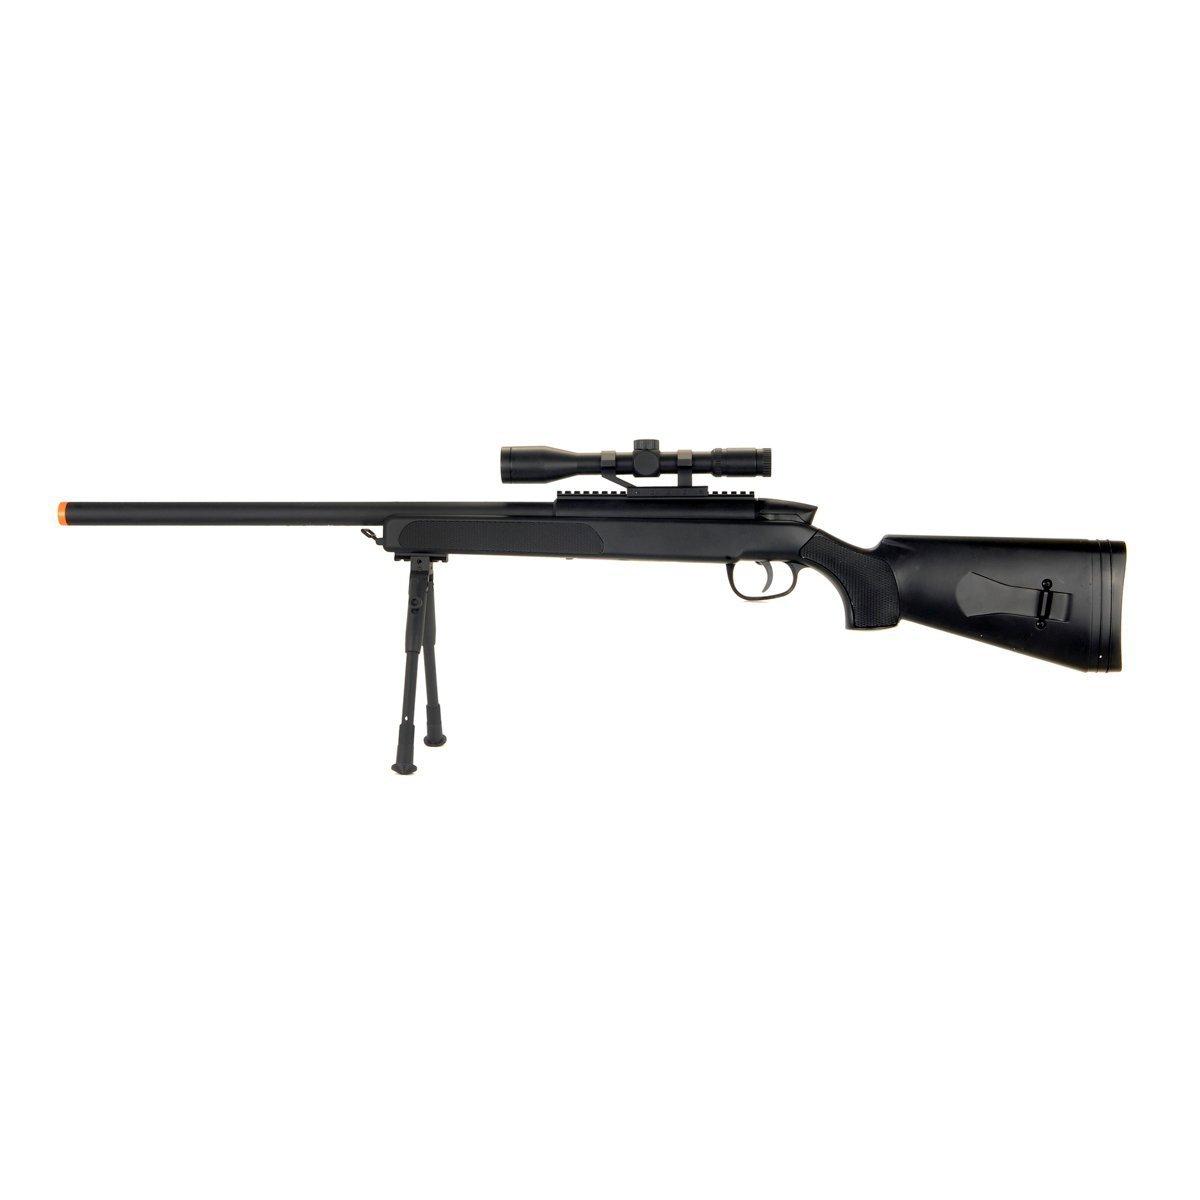 Velocity Airsoft Spring VA51 fps-415 bolt action airsoft sniper rifle(Airsoft Gun)